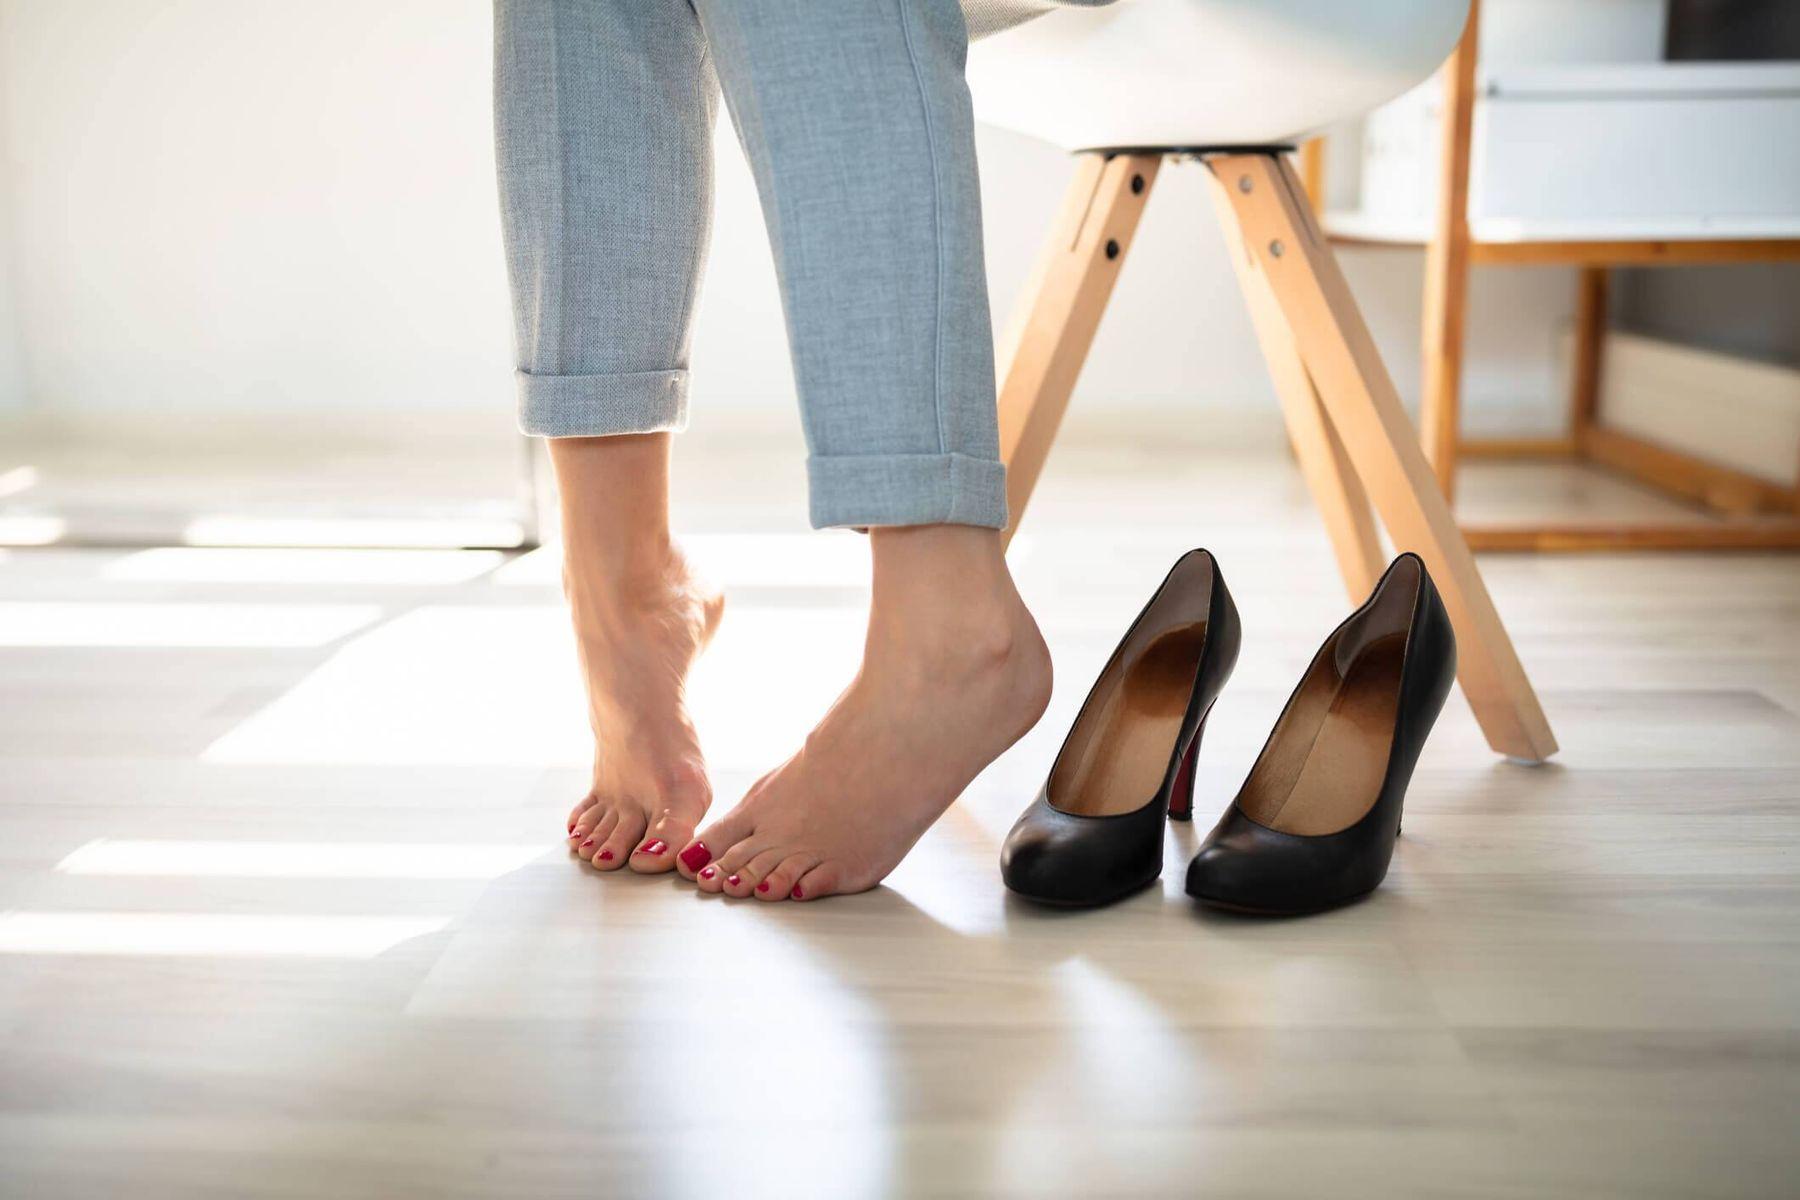 Saiba como tirar o chulé dos pés e sapatos definitivamente